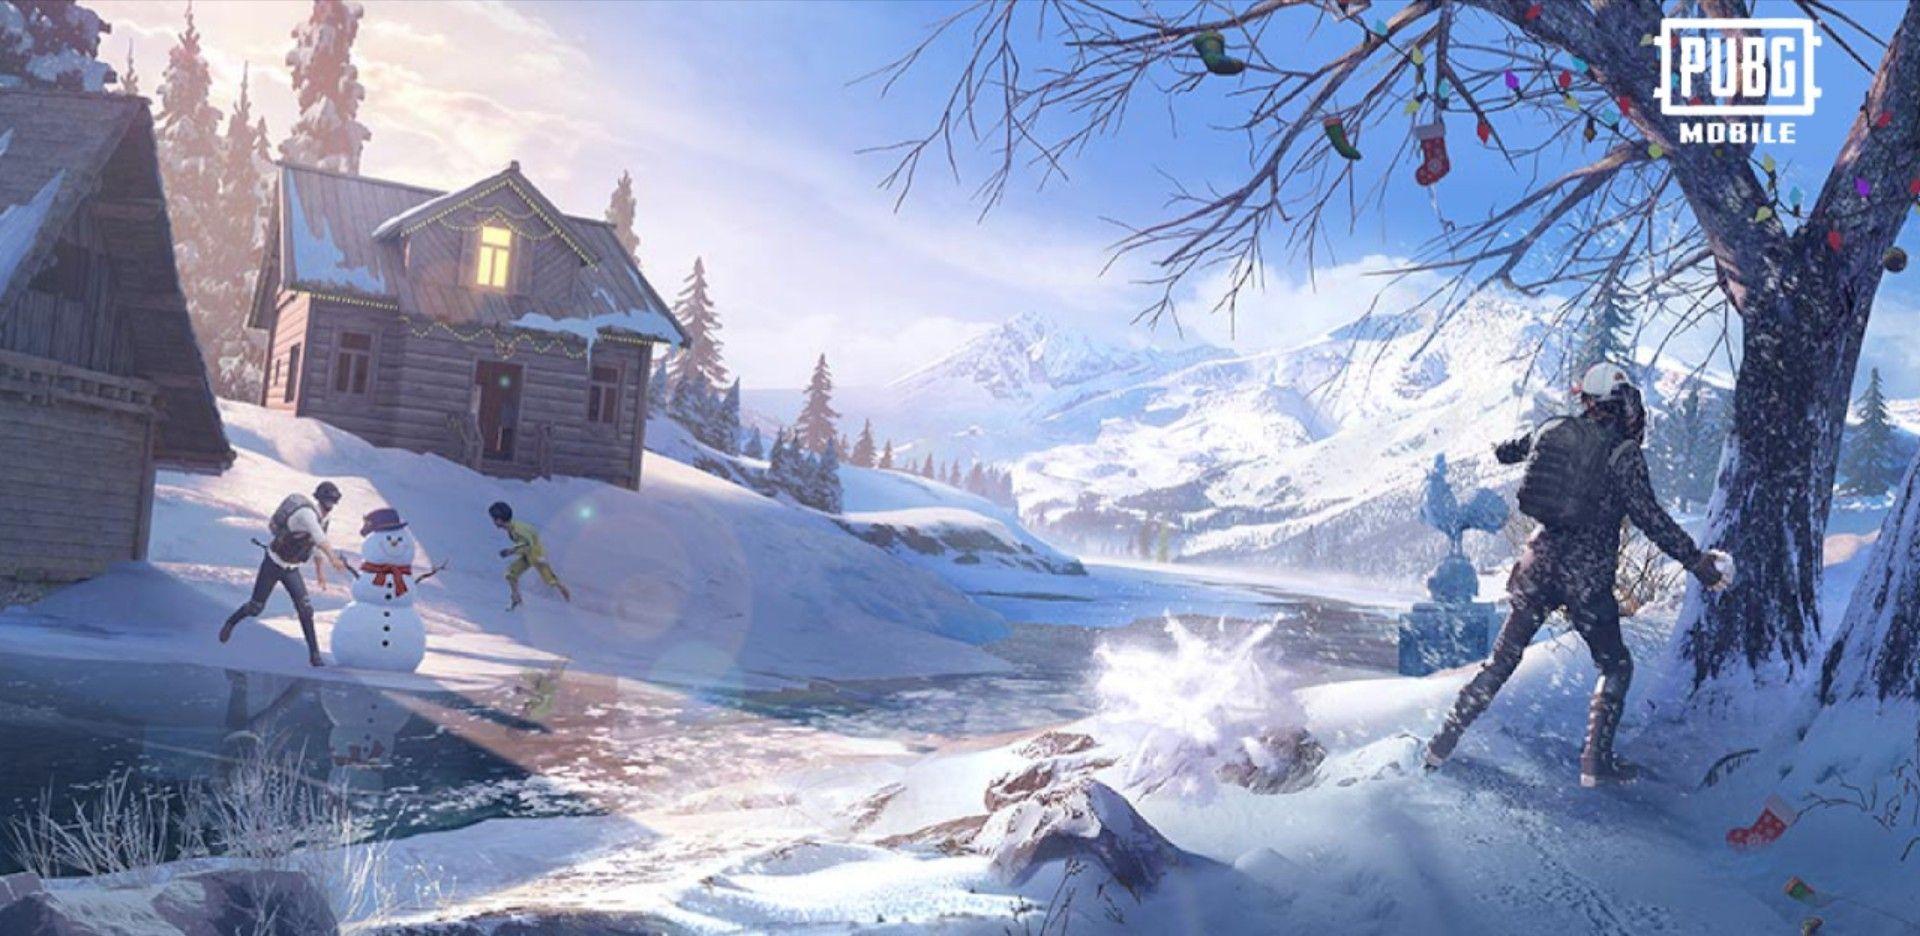 Pubg Wallpaper Pubg Mobile Season 16 Snow Winter Christmas Wallpa Instagram Christmas Wallpaper New Backgrounds